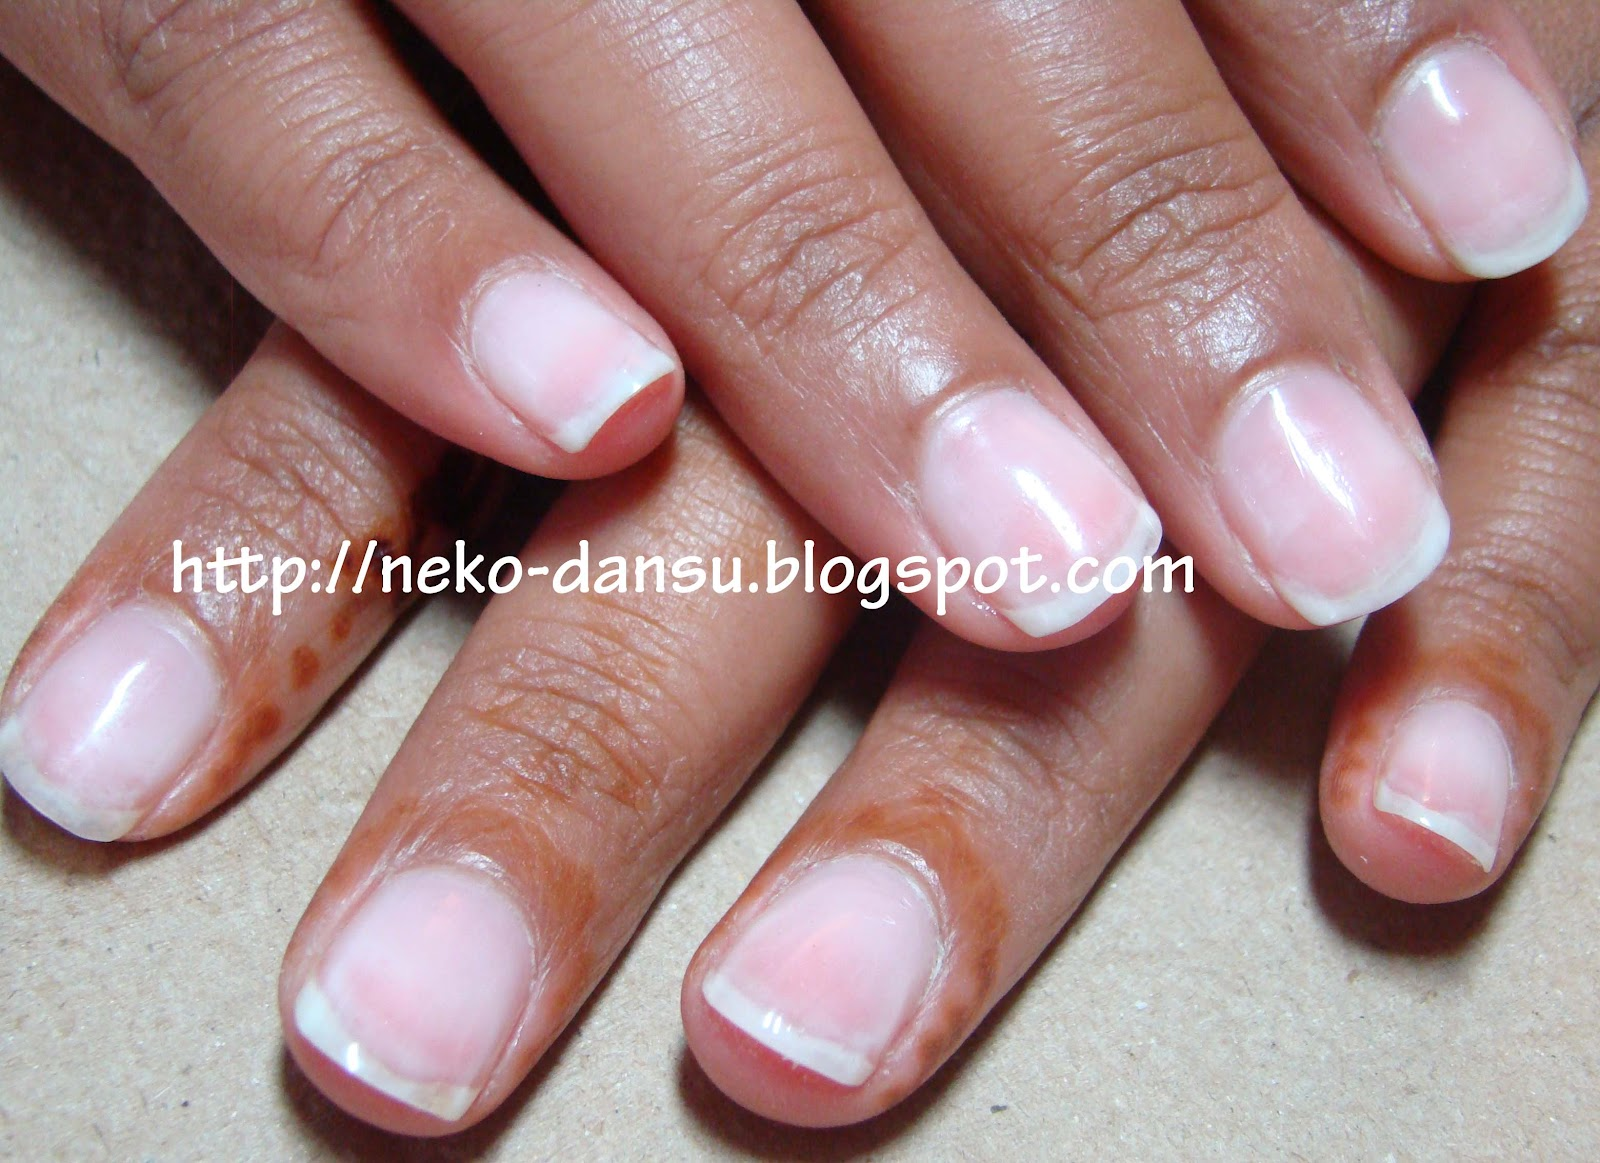 Neko-dansu\'s Nails: UV Gel Clear Overlay